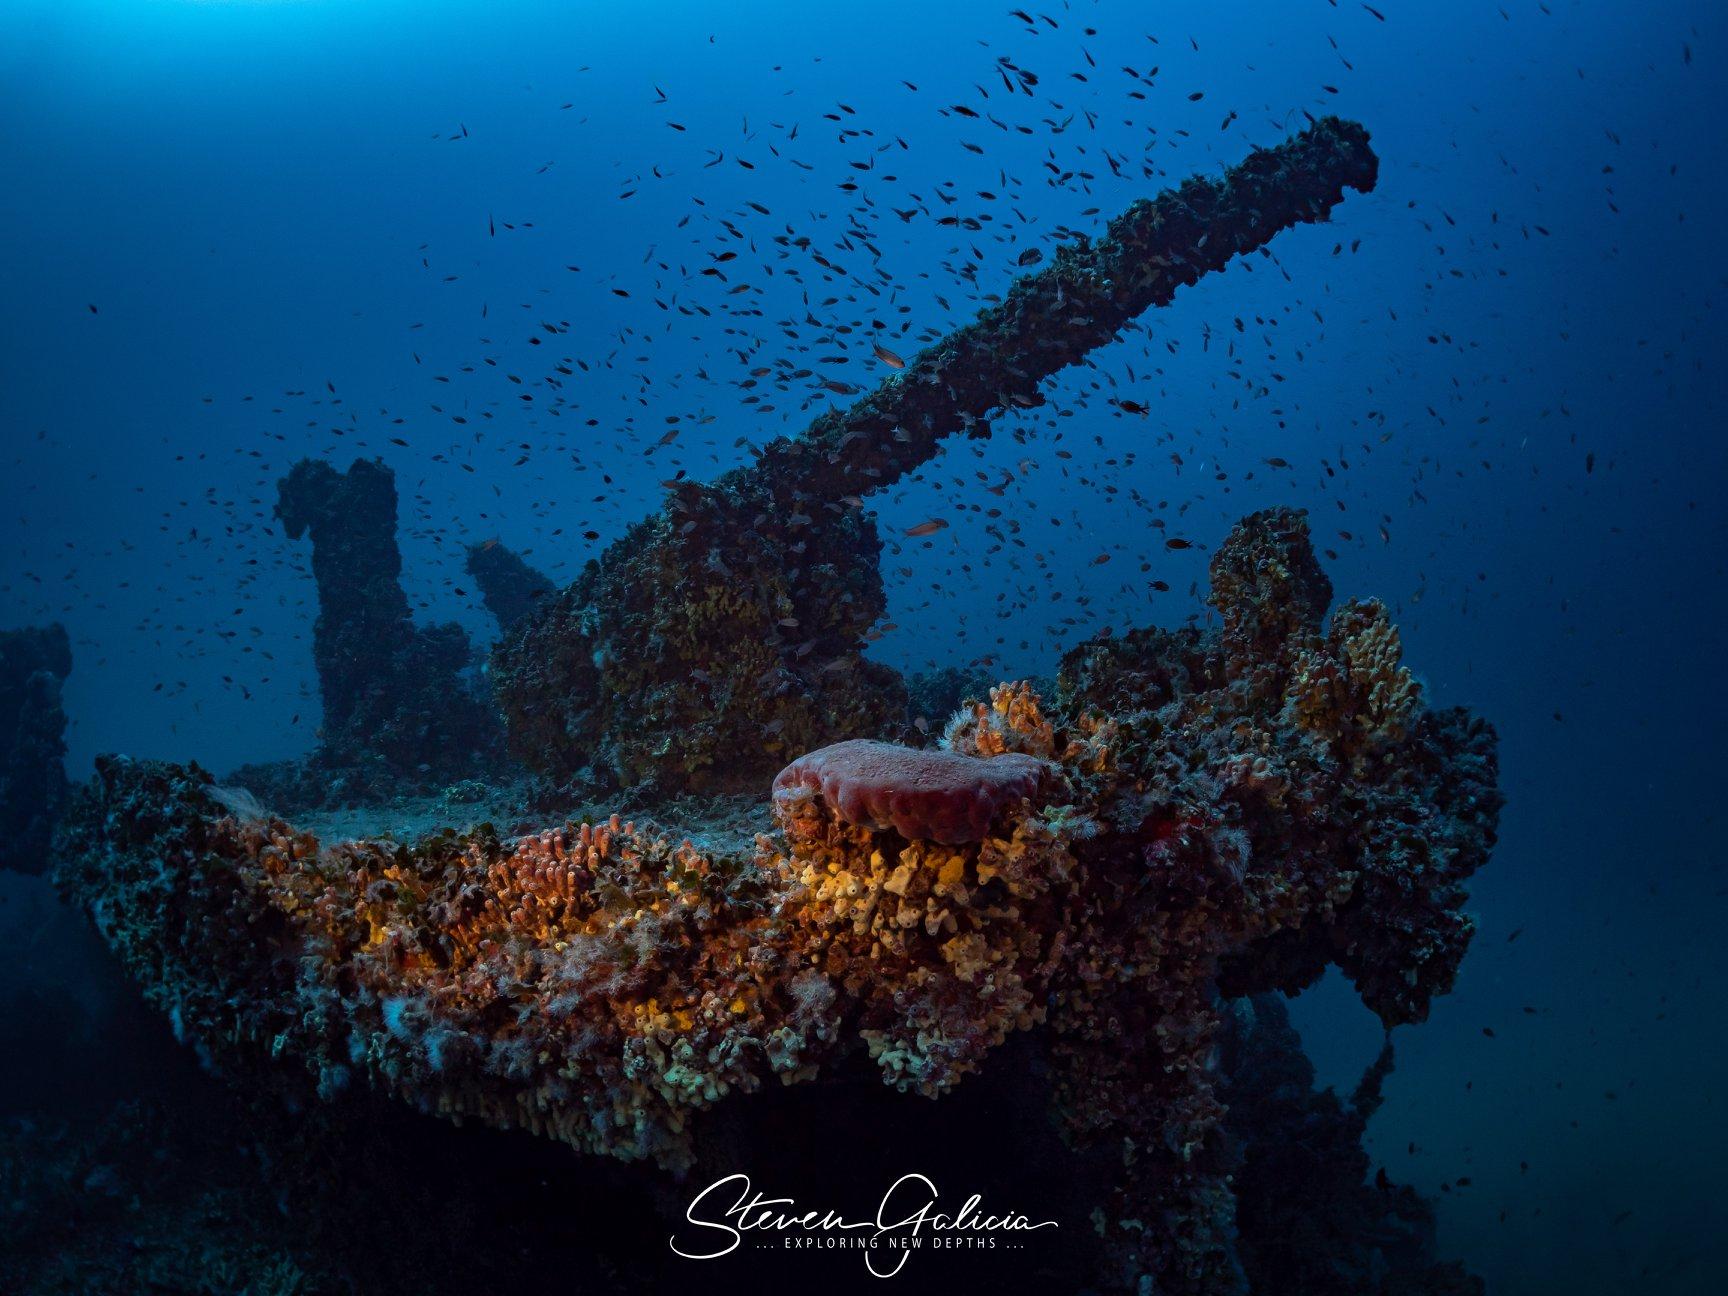 HMS Nasturtium, aft gun [Steven Galicia]